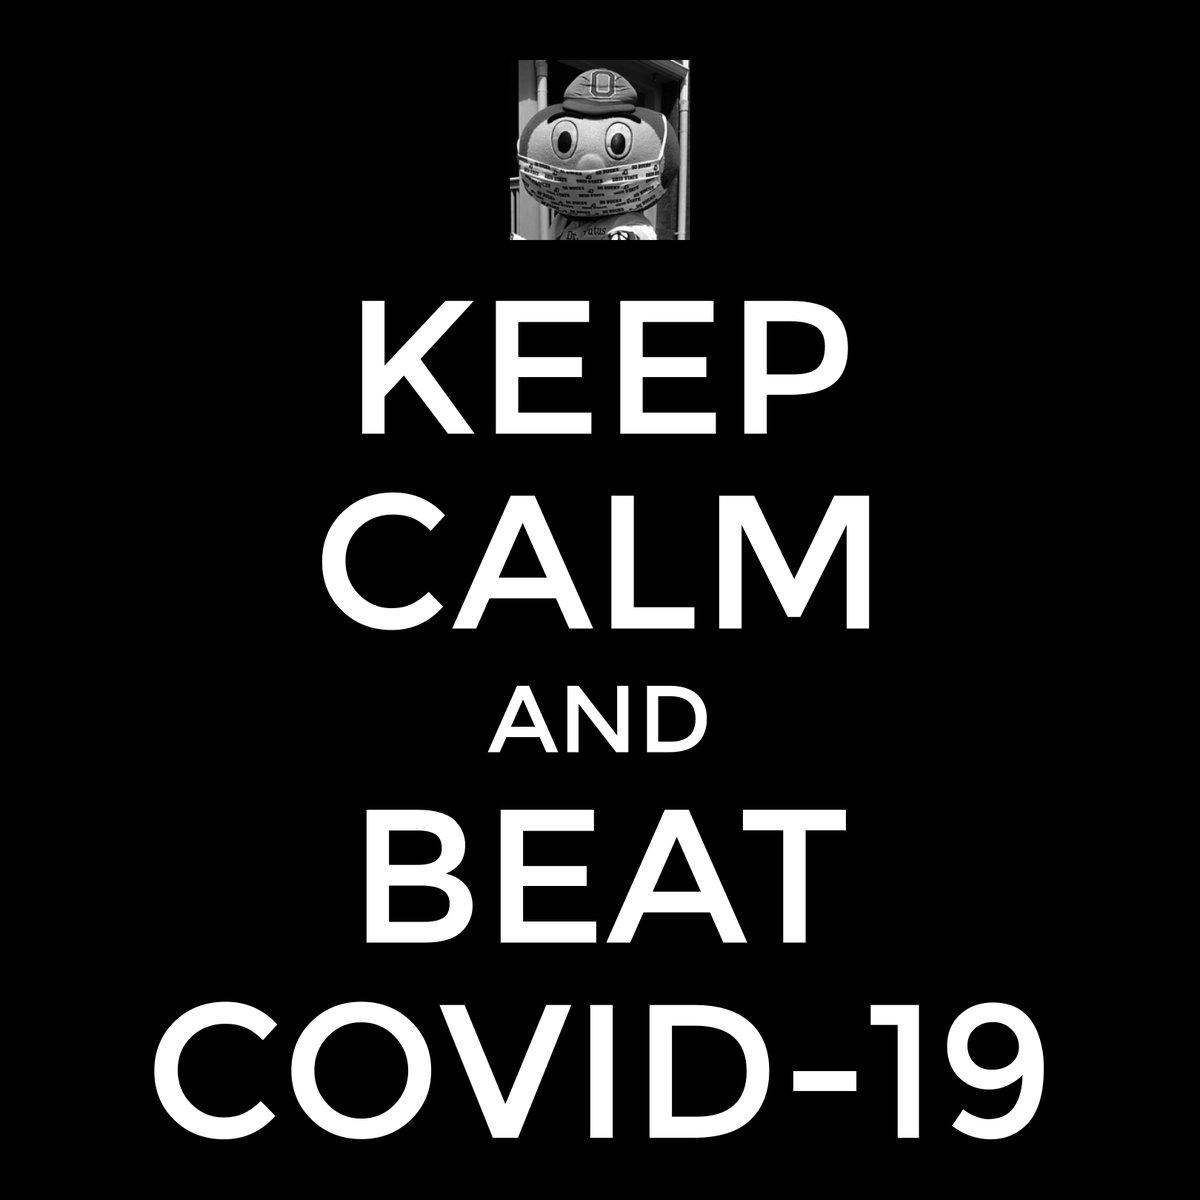 Keep calm and beat COVID-19  #GoBucks #OhioState  #BuckeyeNation #OhioStateFootball #buckeyes #beatCOVID19 #bubbles https://t.co/3xrbBDjyJR